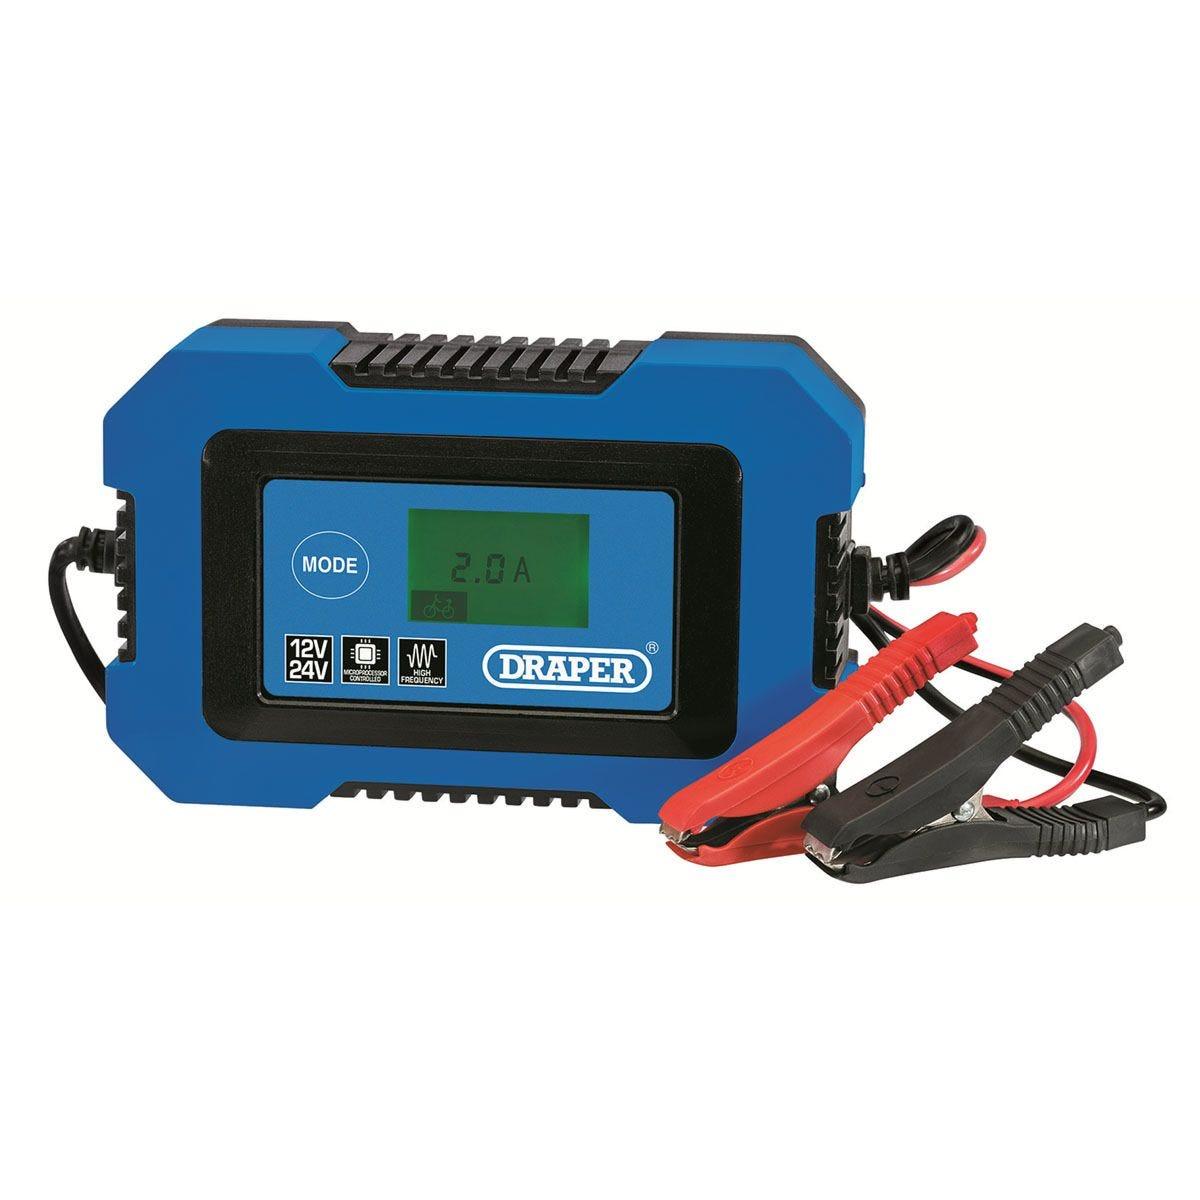 Draper 10A 12V/24V Battery Charger - Blue & Black